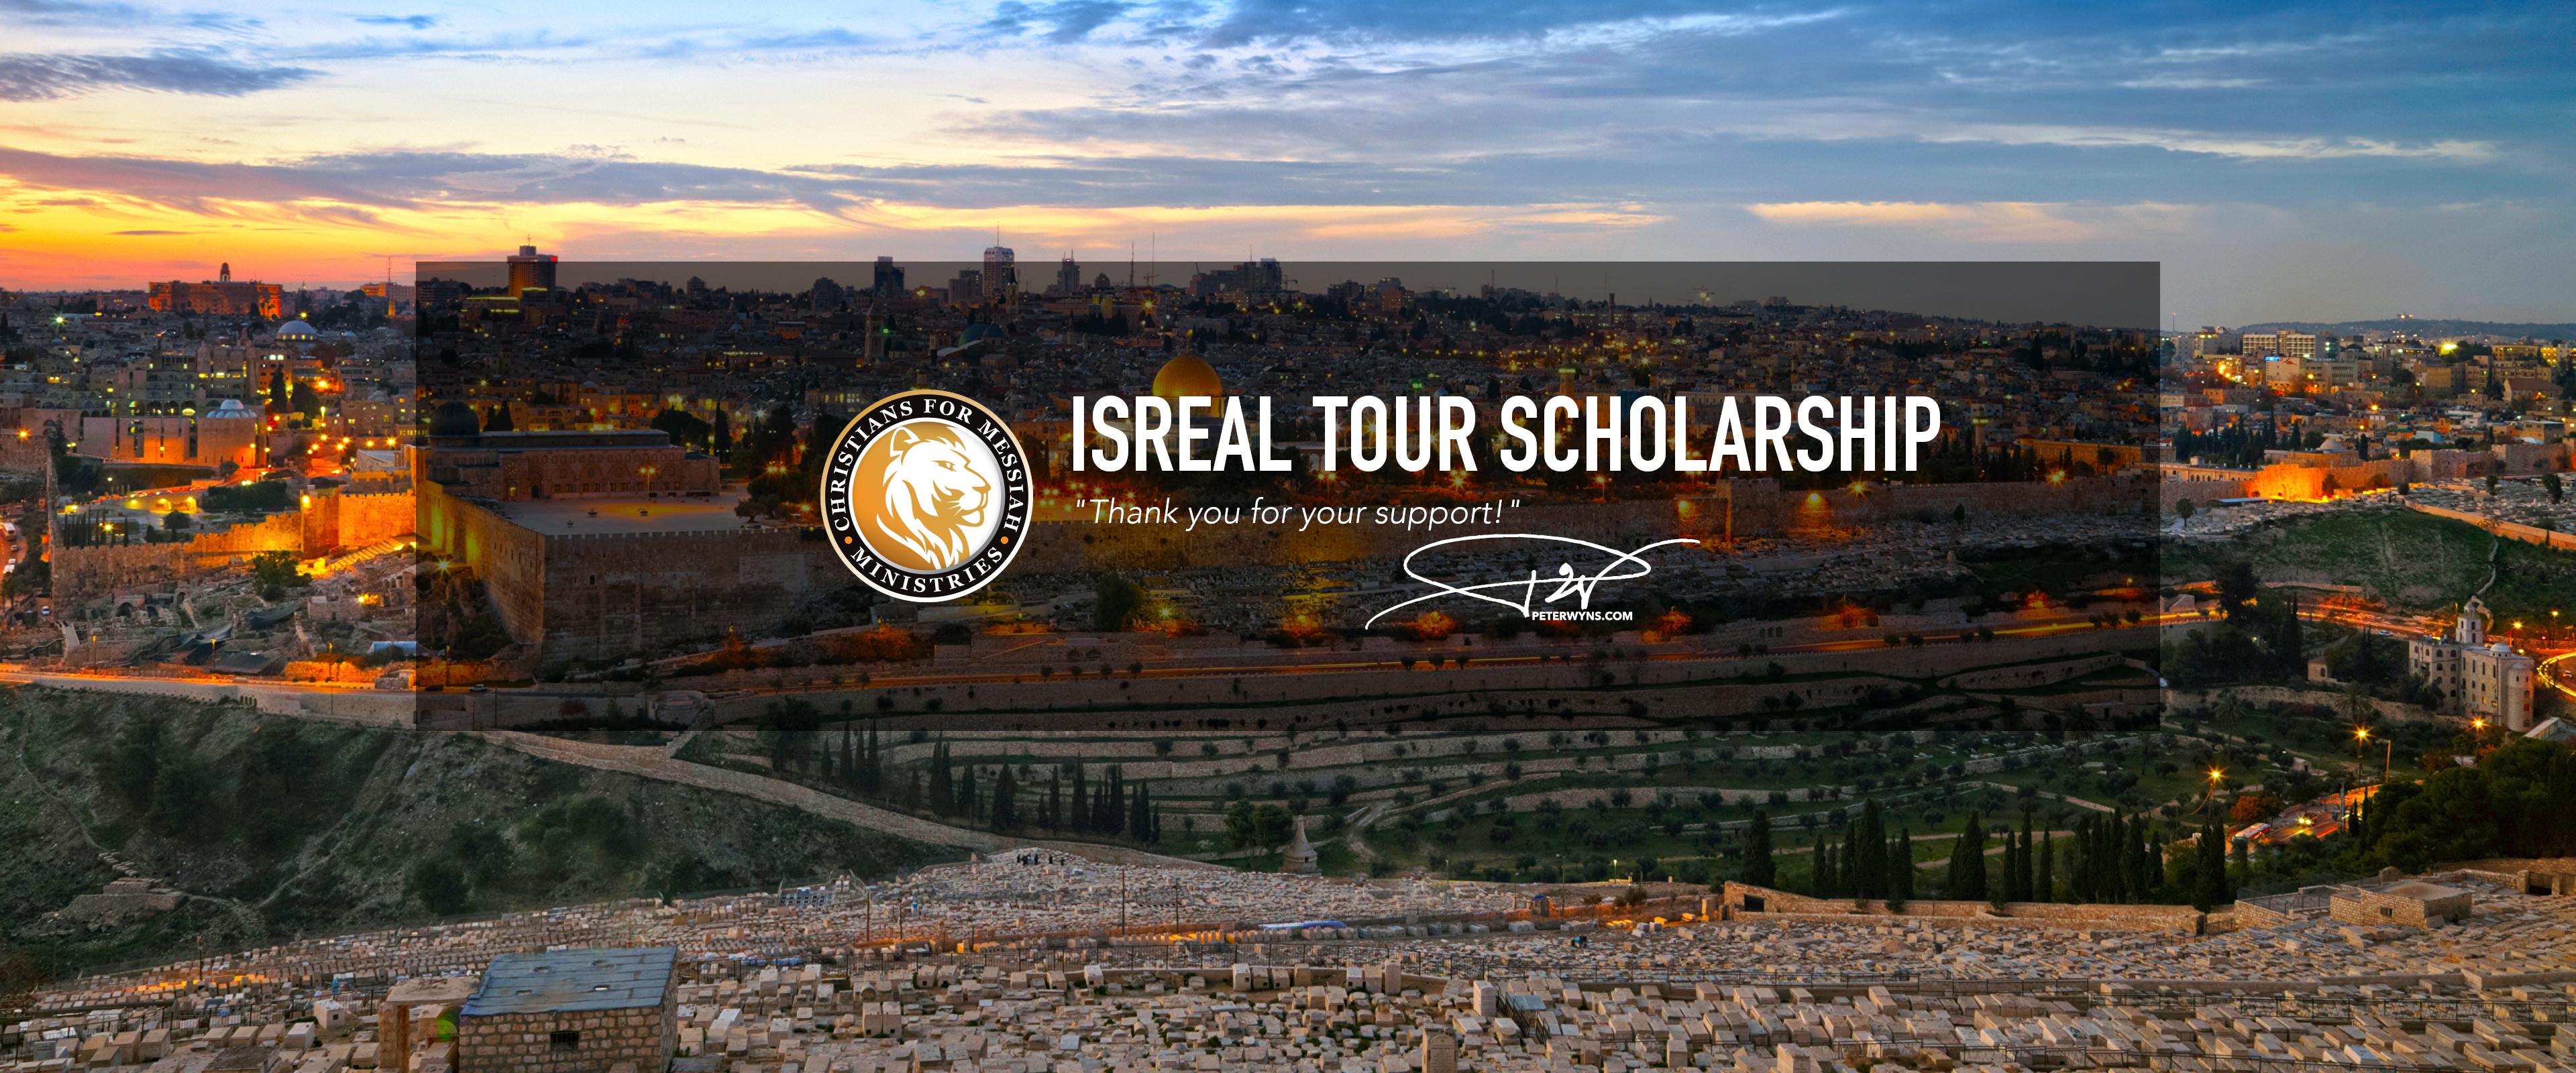 israel tour scholarship banner